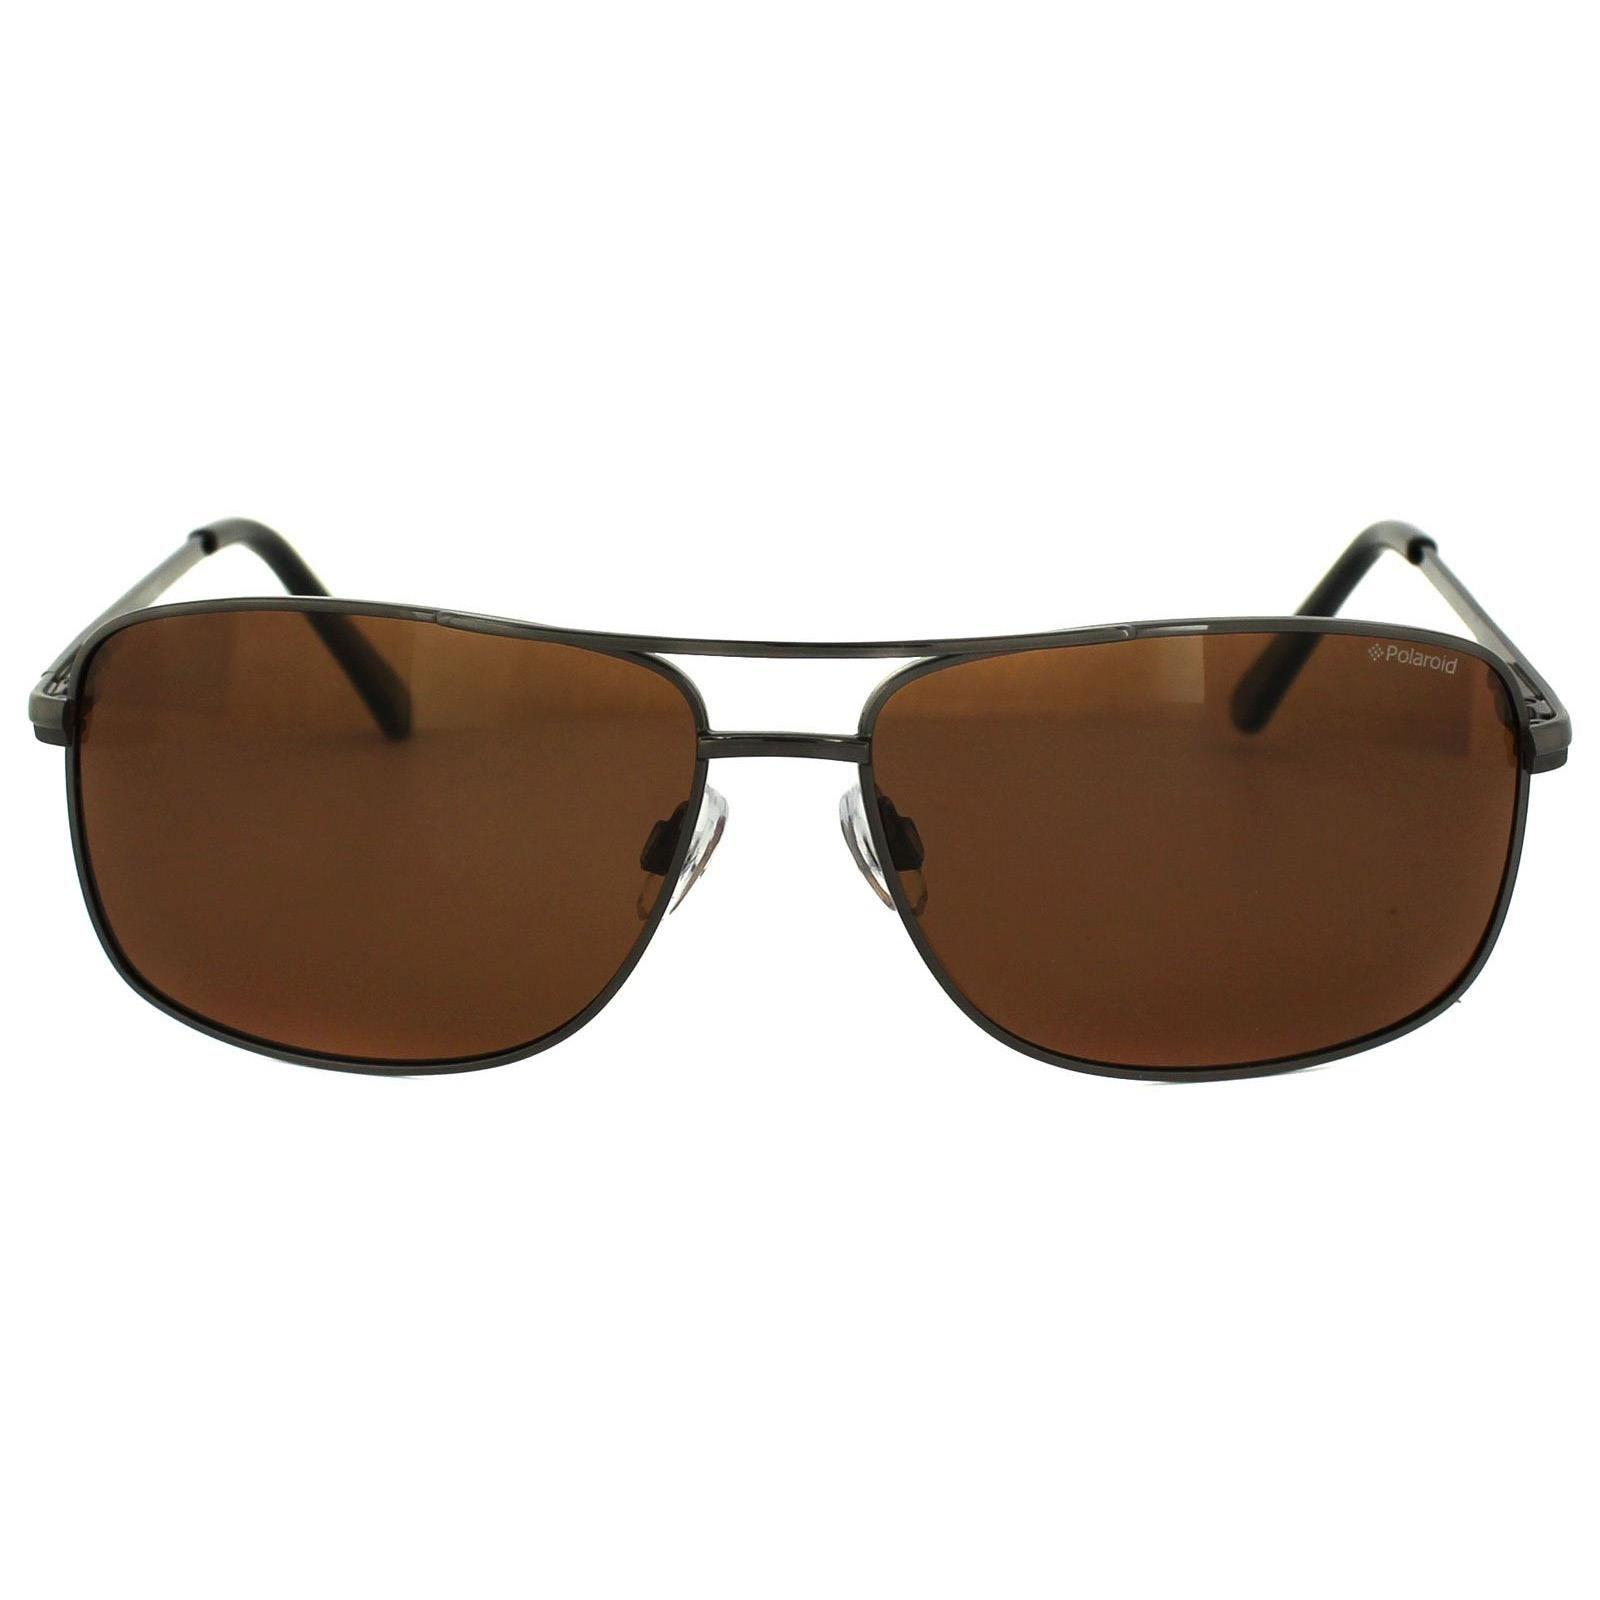 Polaroid Sunglasses P4409 BC5 HE Gunmetal Copper Polarized